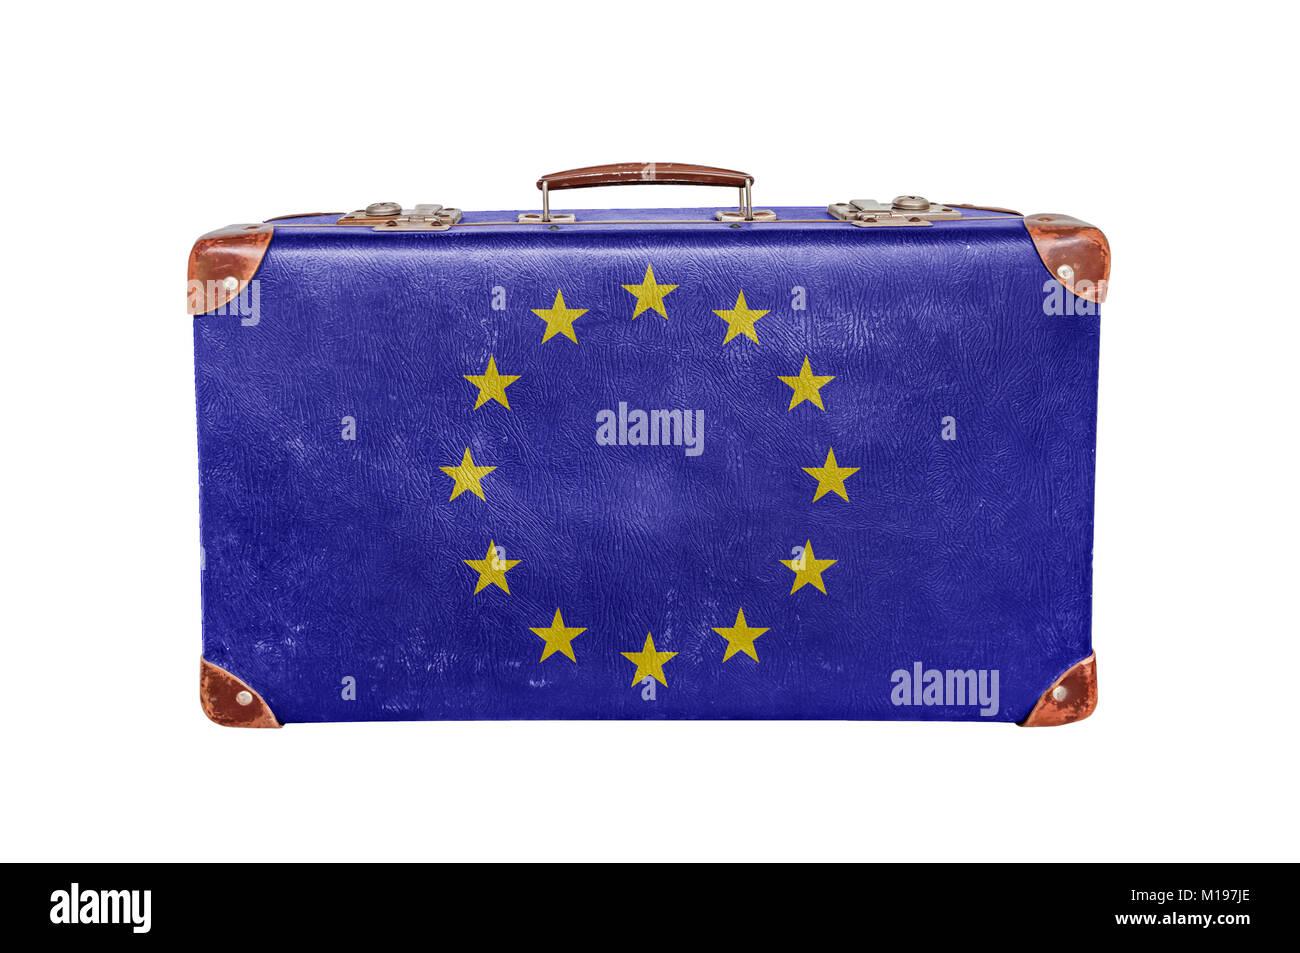 Vintage suitcase with European Union flag isolated on white background - Stock Image